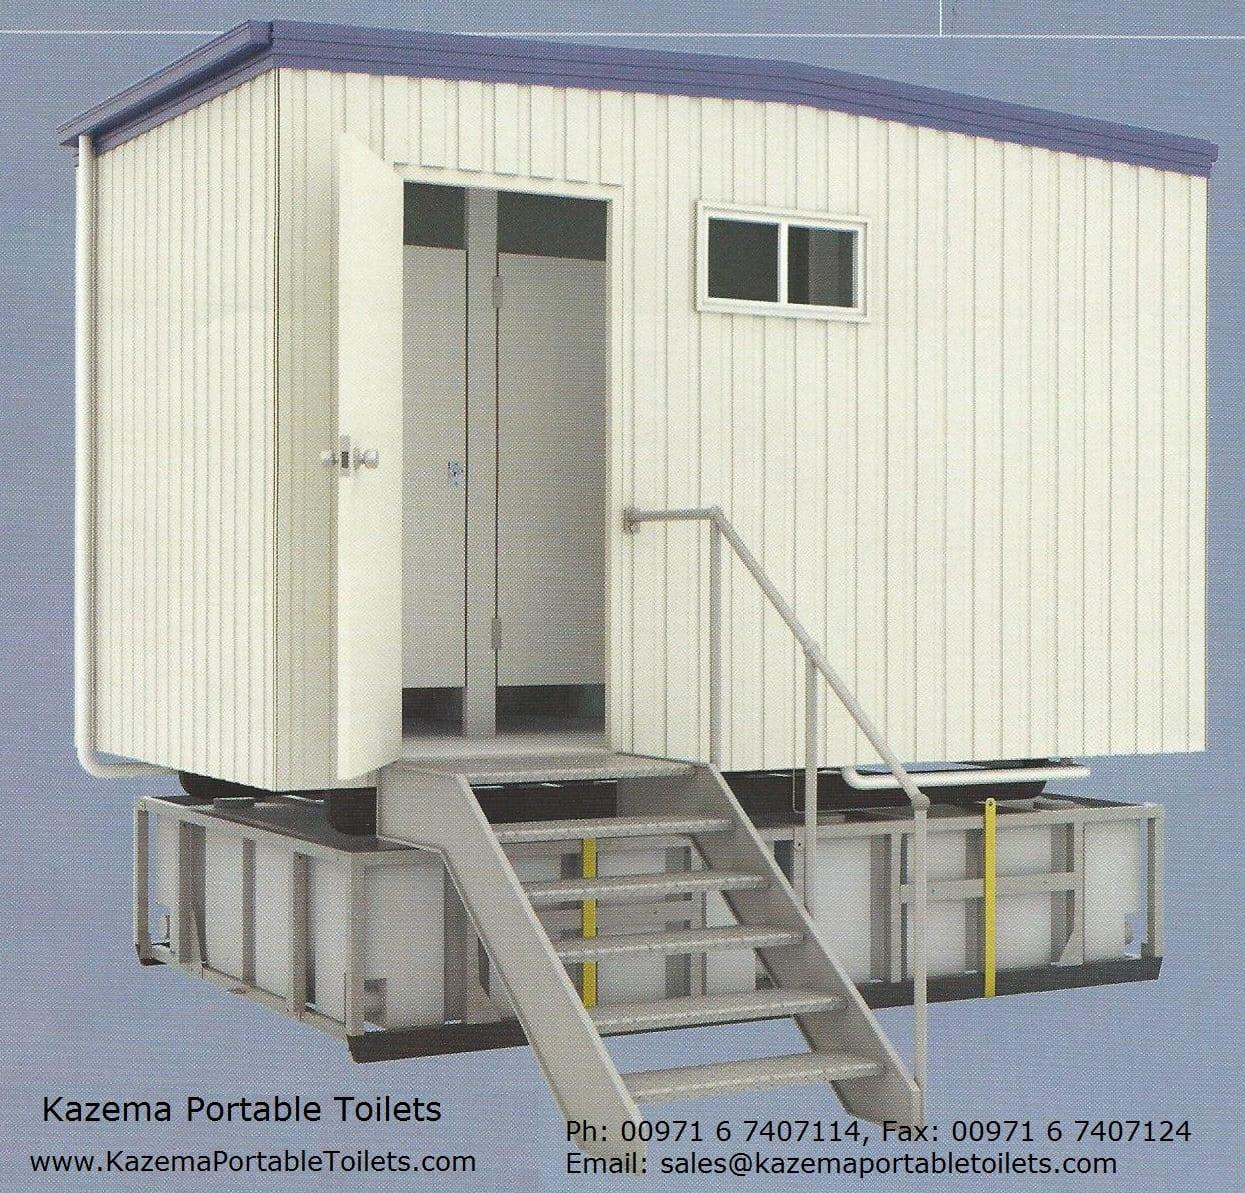 Prefabricated Cabin Toilets Portacabin Kazema Portable Toilets